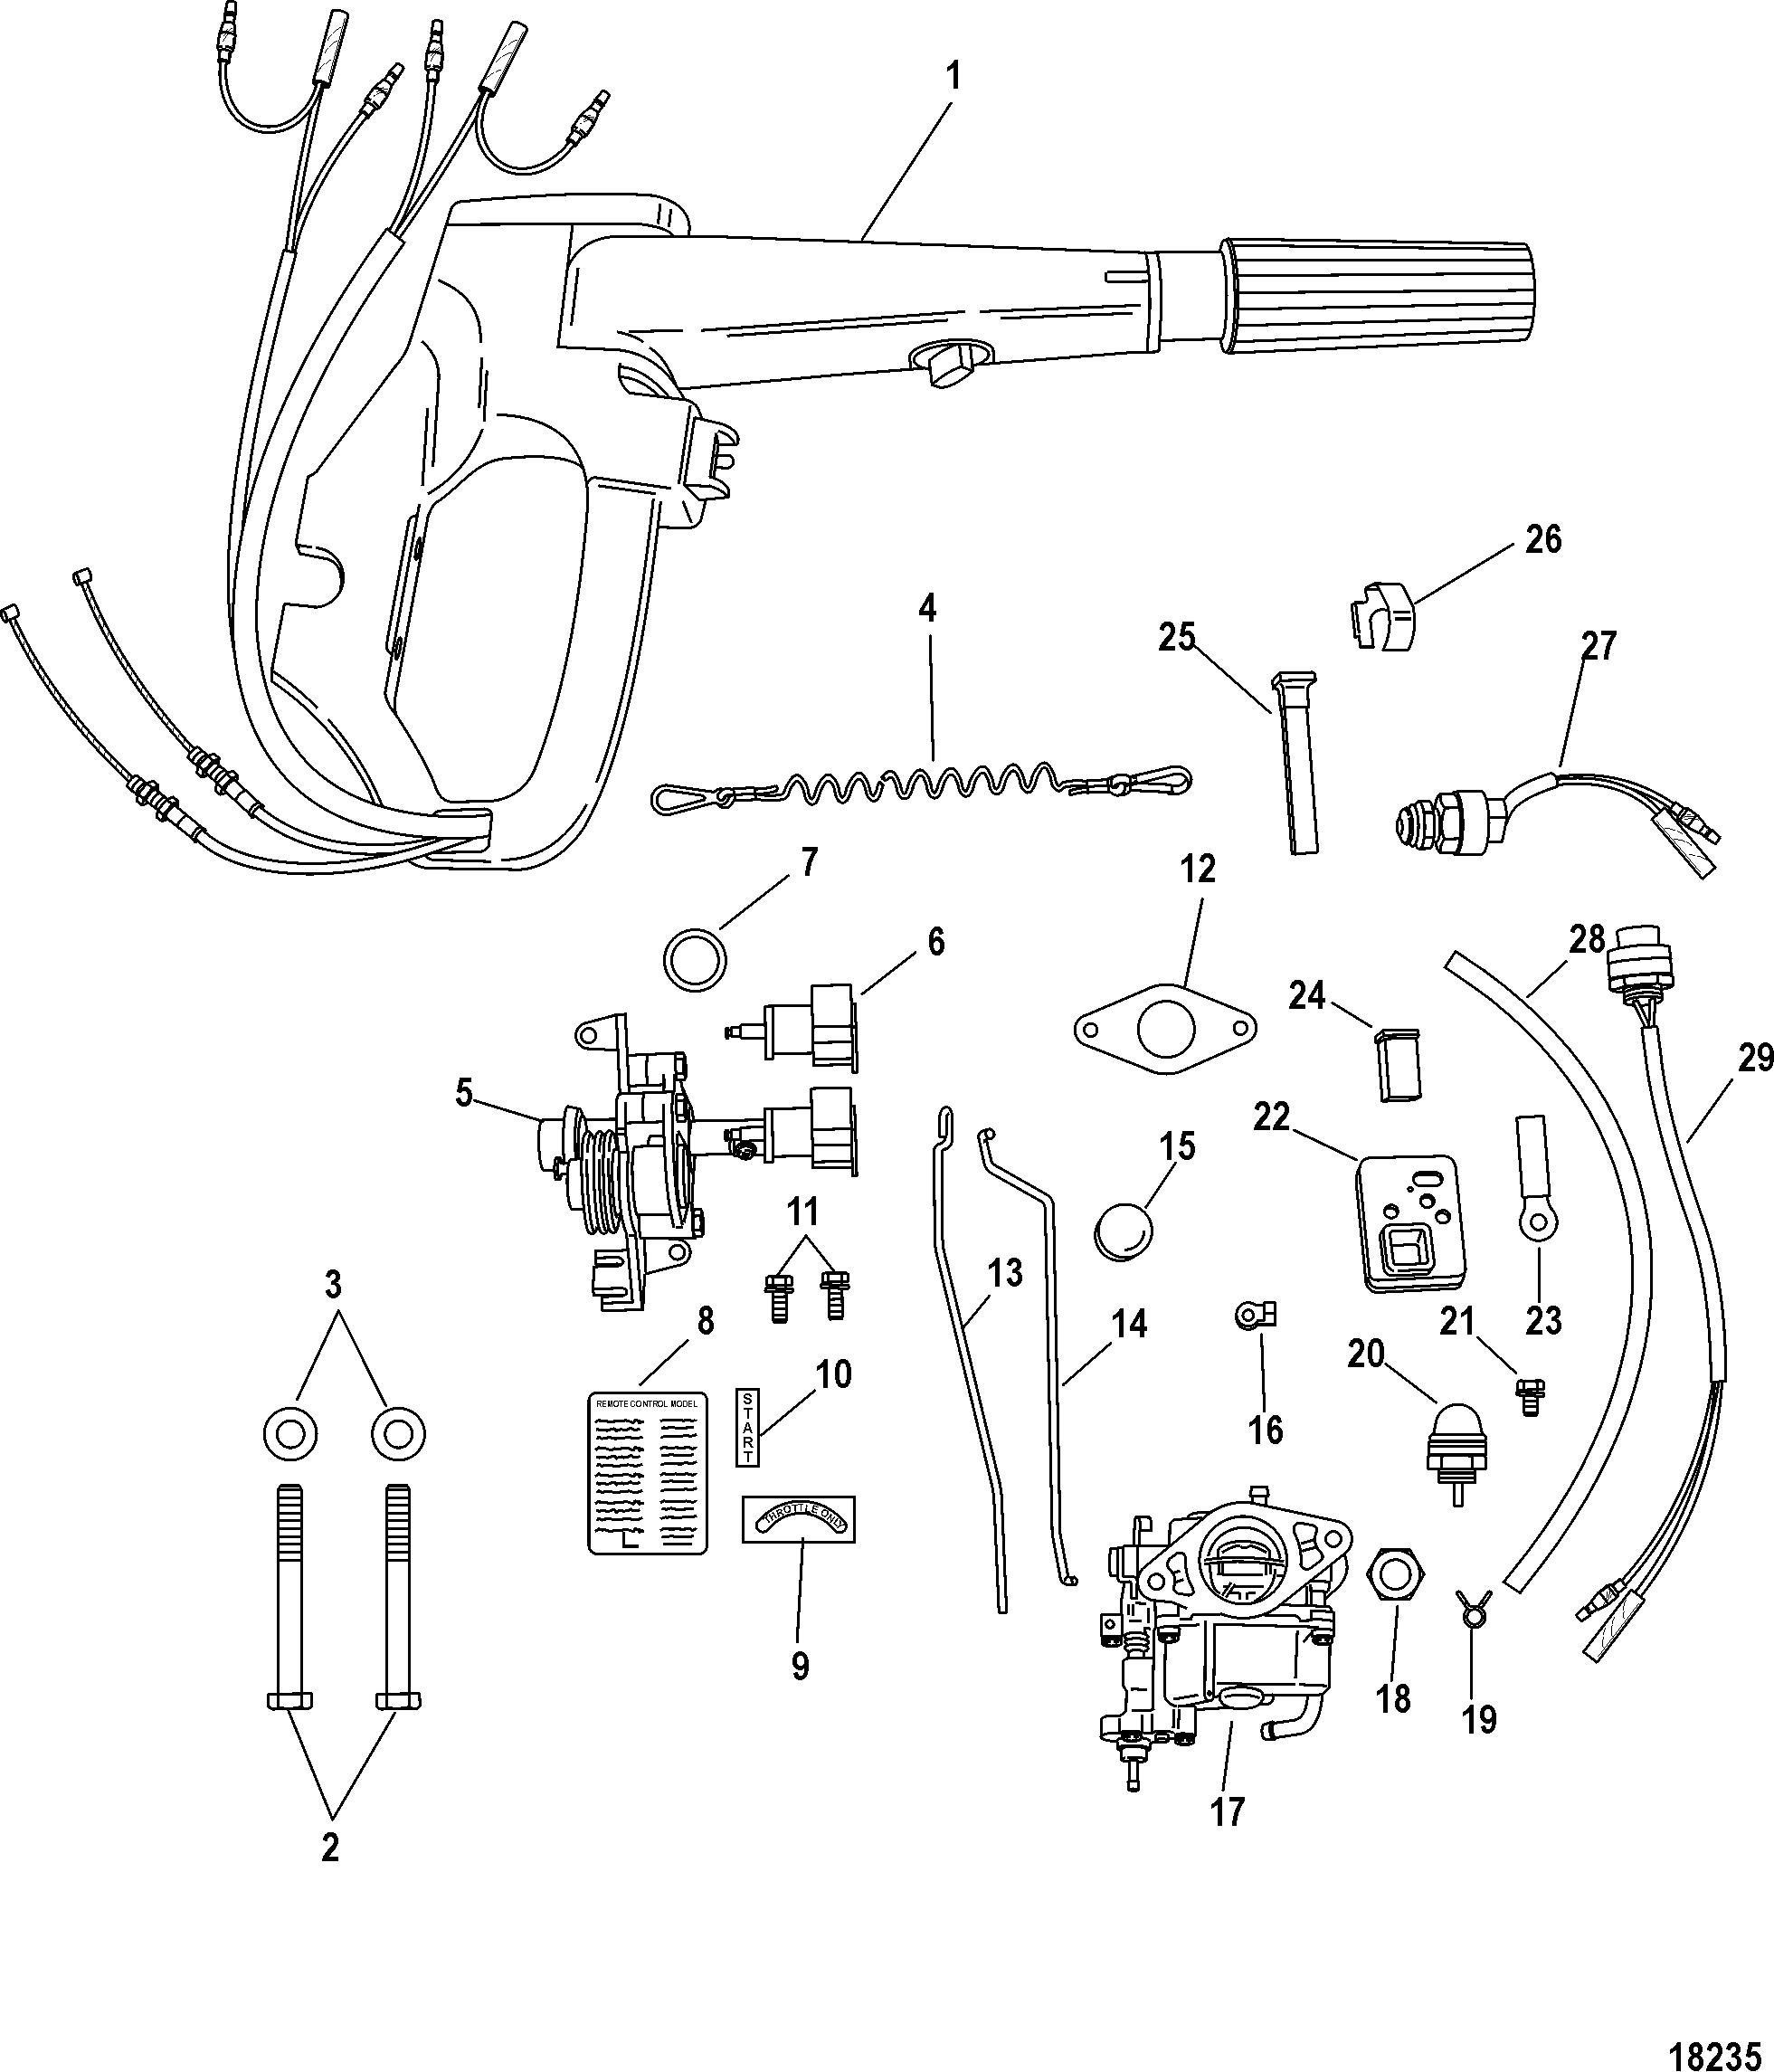 Mercury | MARINER | 9 9 (4-STROKE)(209cc) | 0P325500 & Up